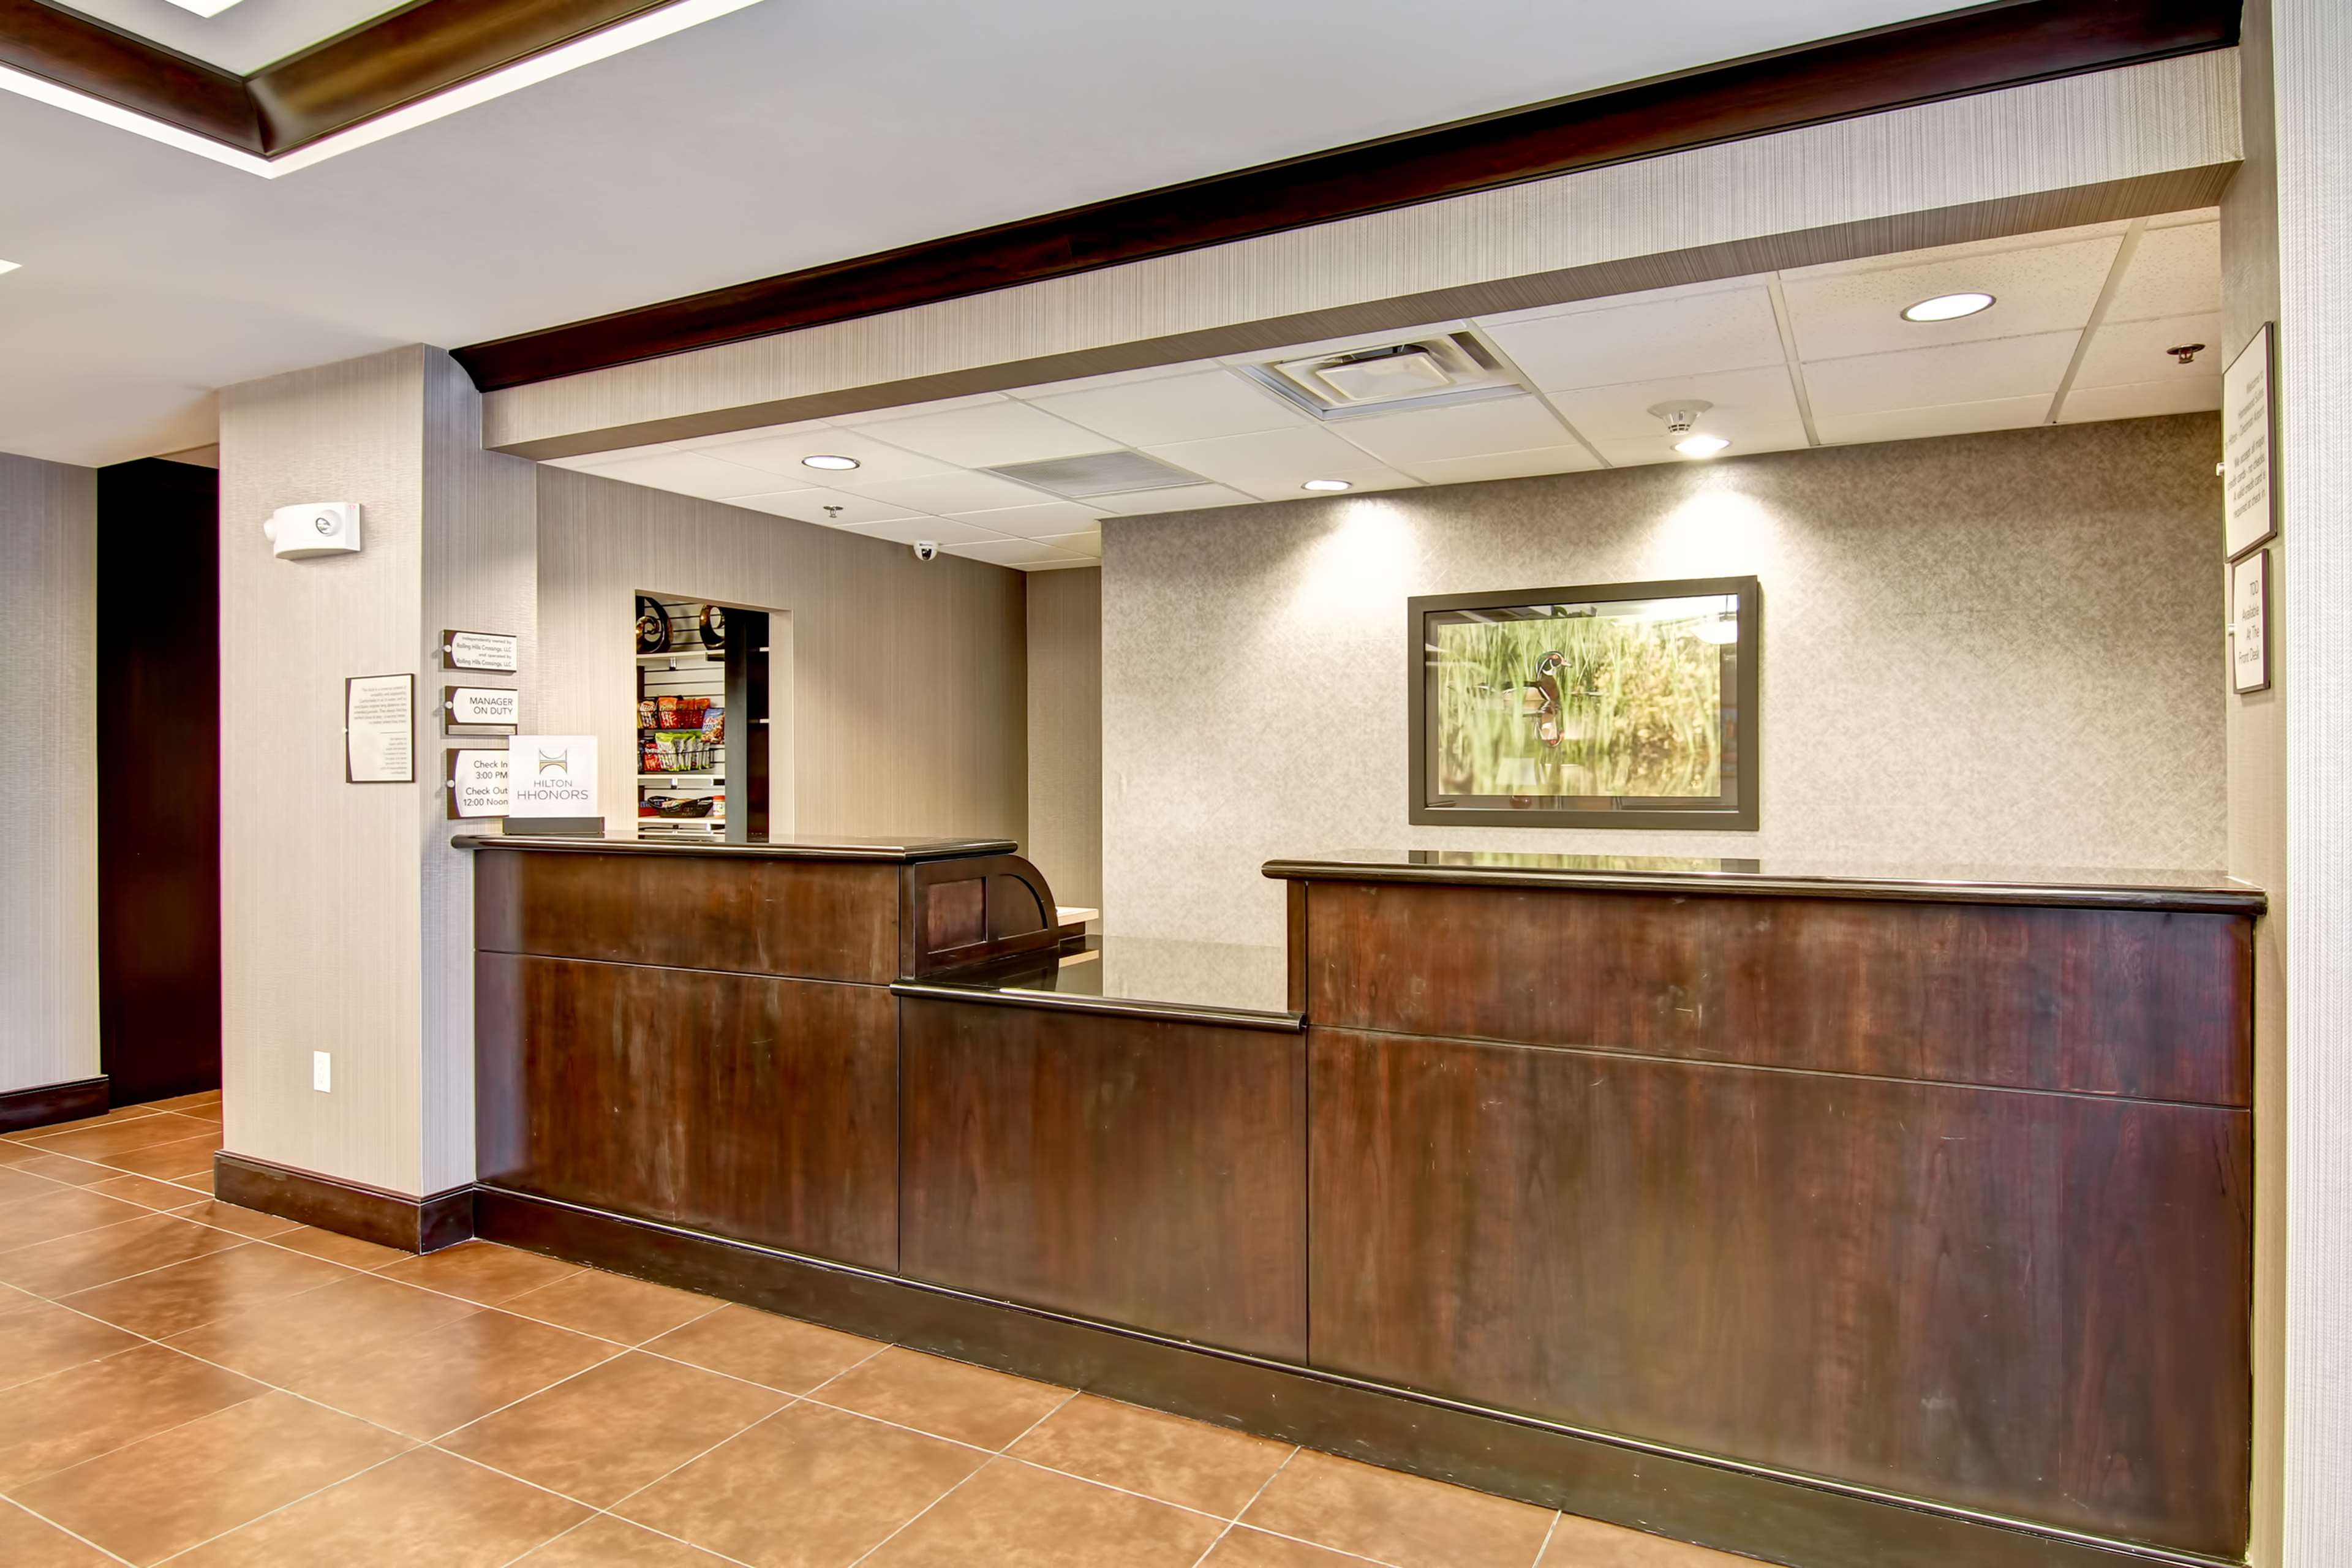 Homewood Suites by Hilton Cincinnati Airport South-Florence image 4